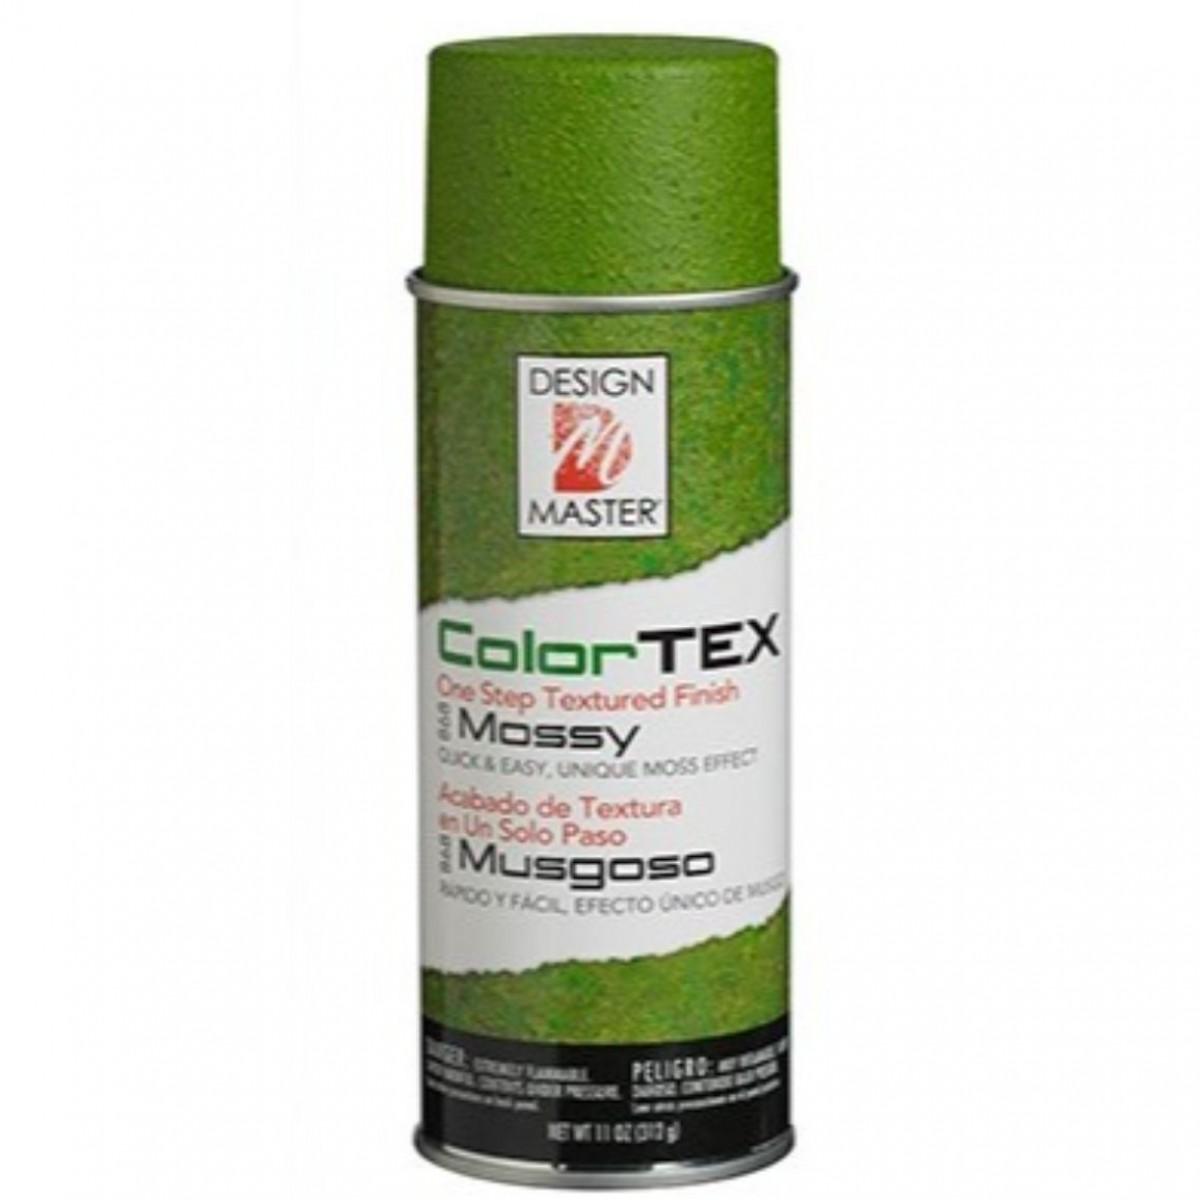 868 Colour TEX Mossy DM Colour Spray Paint - 1 No